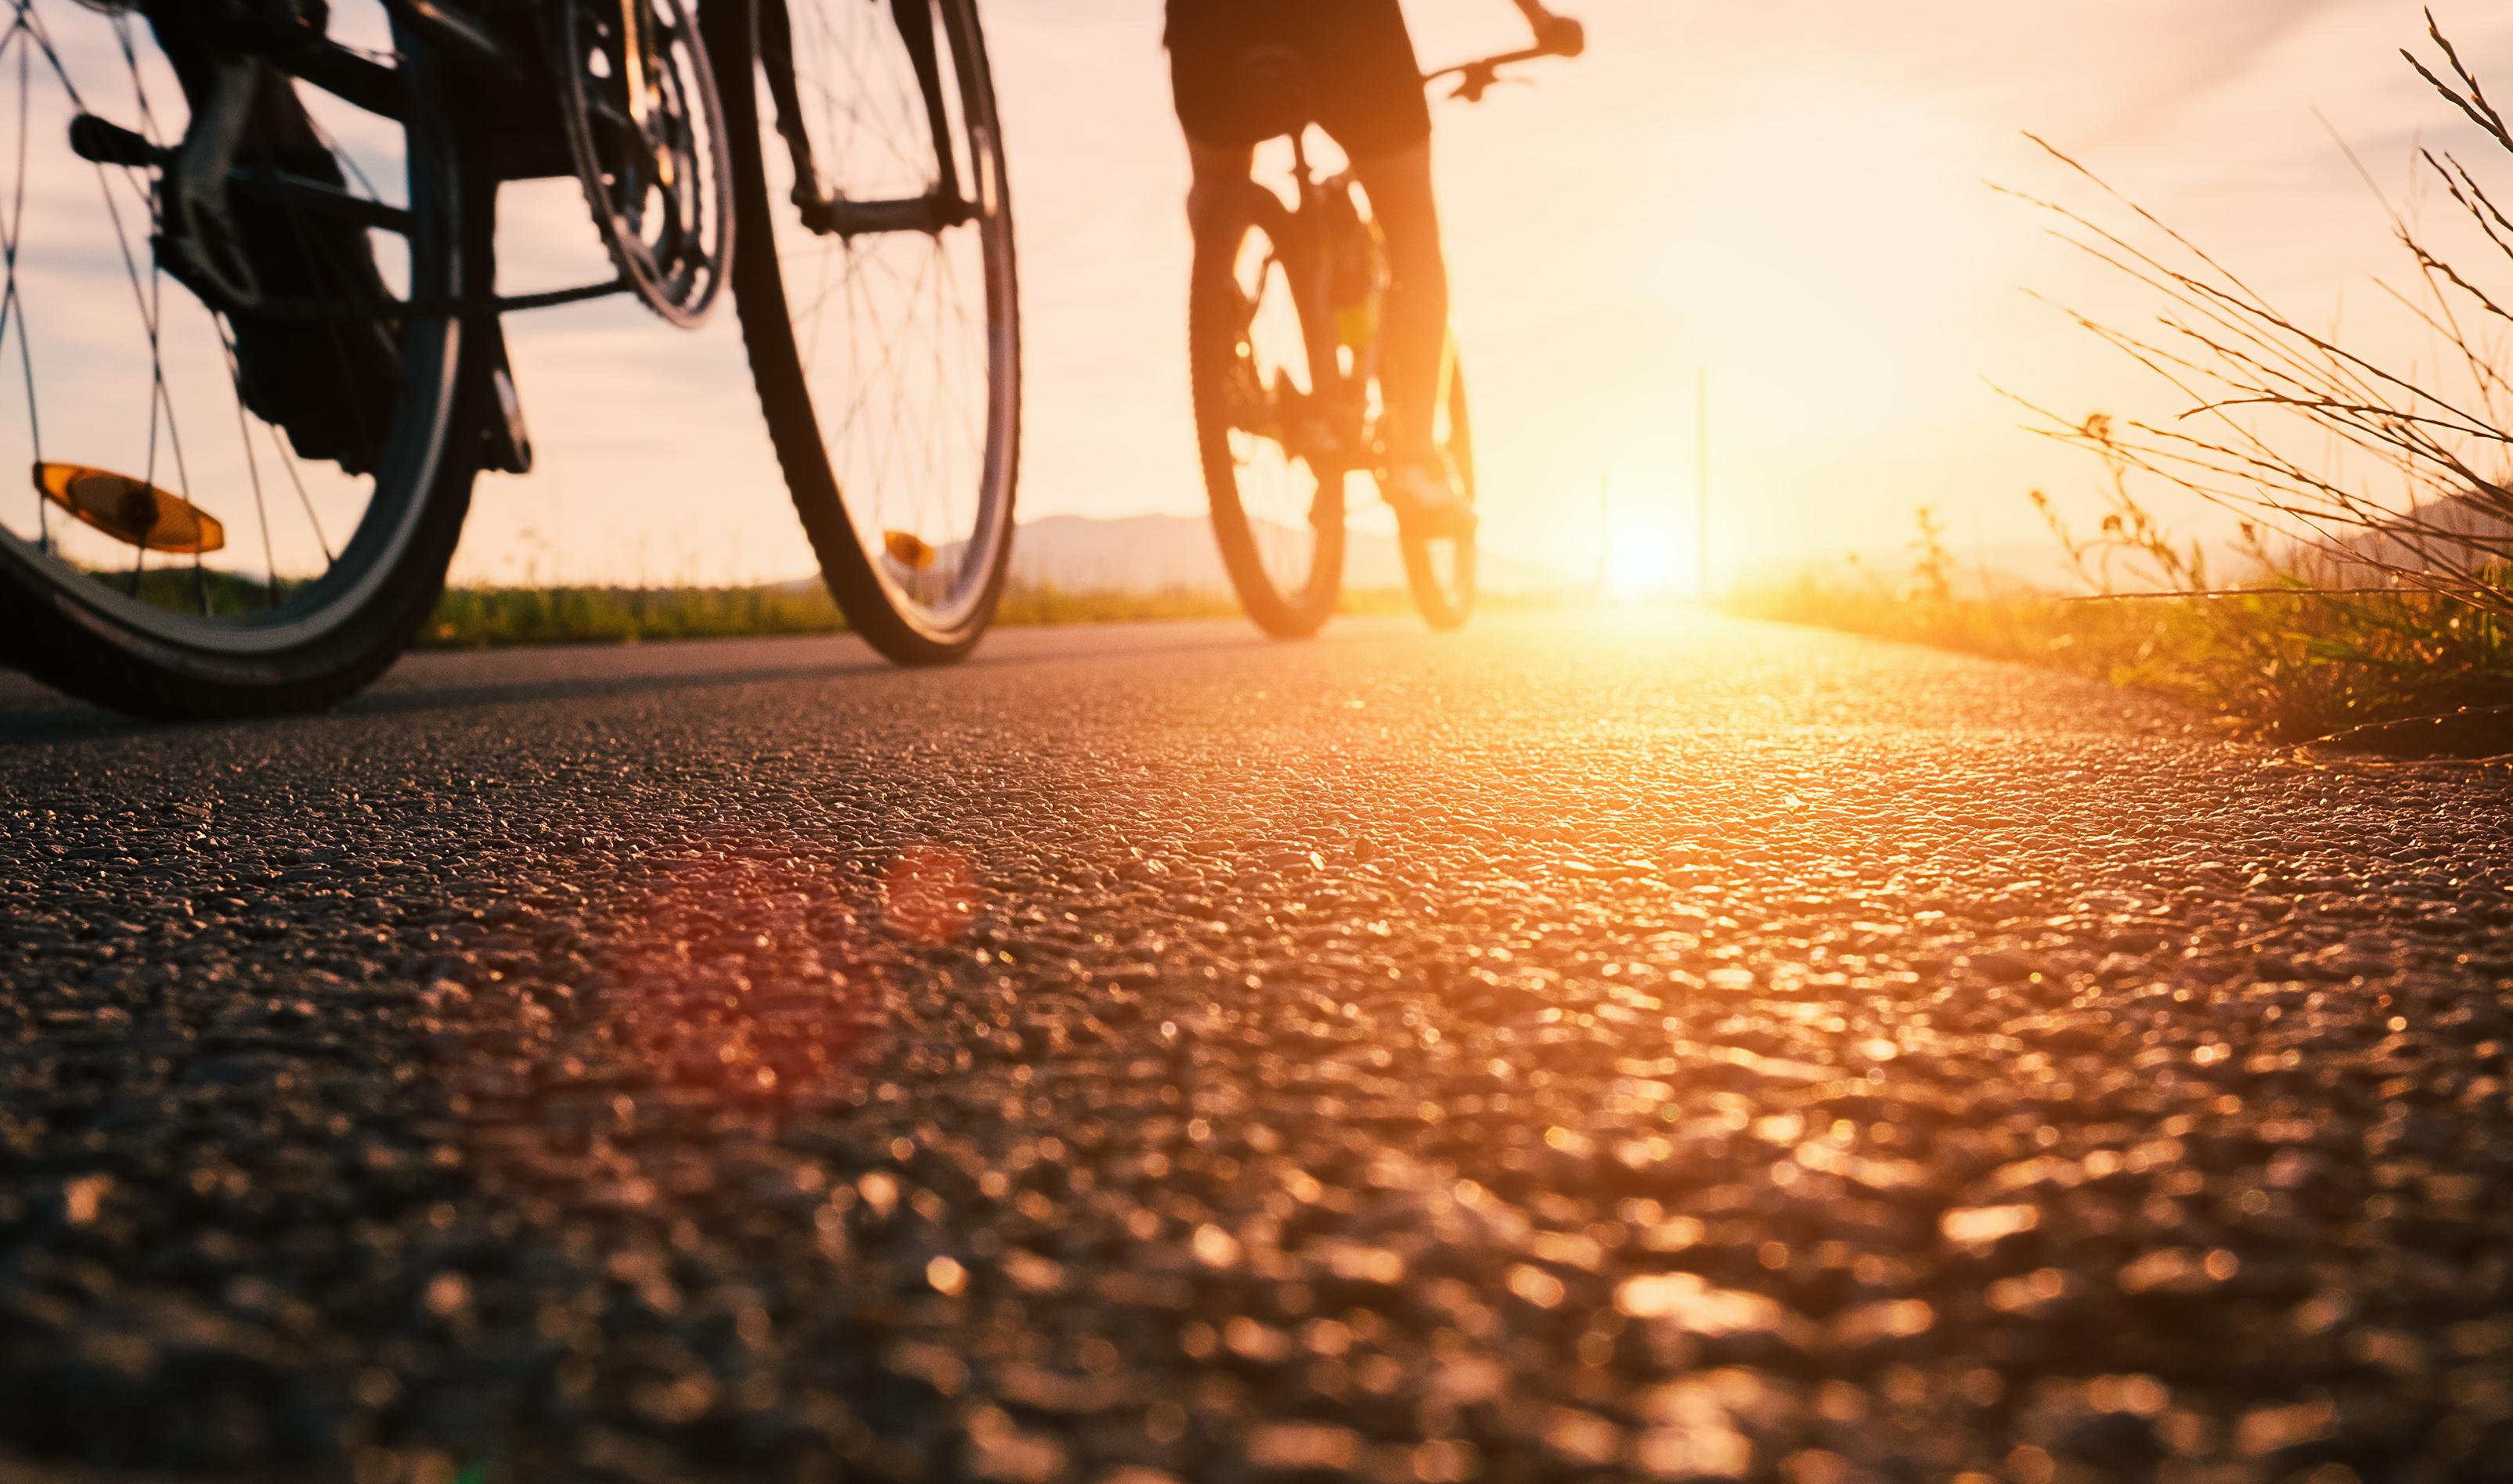 Bike wheels (Solovyova/Thinkstock)